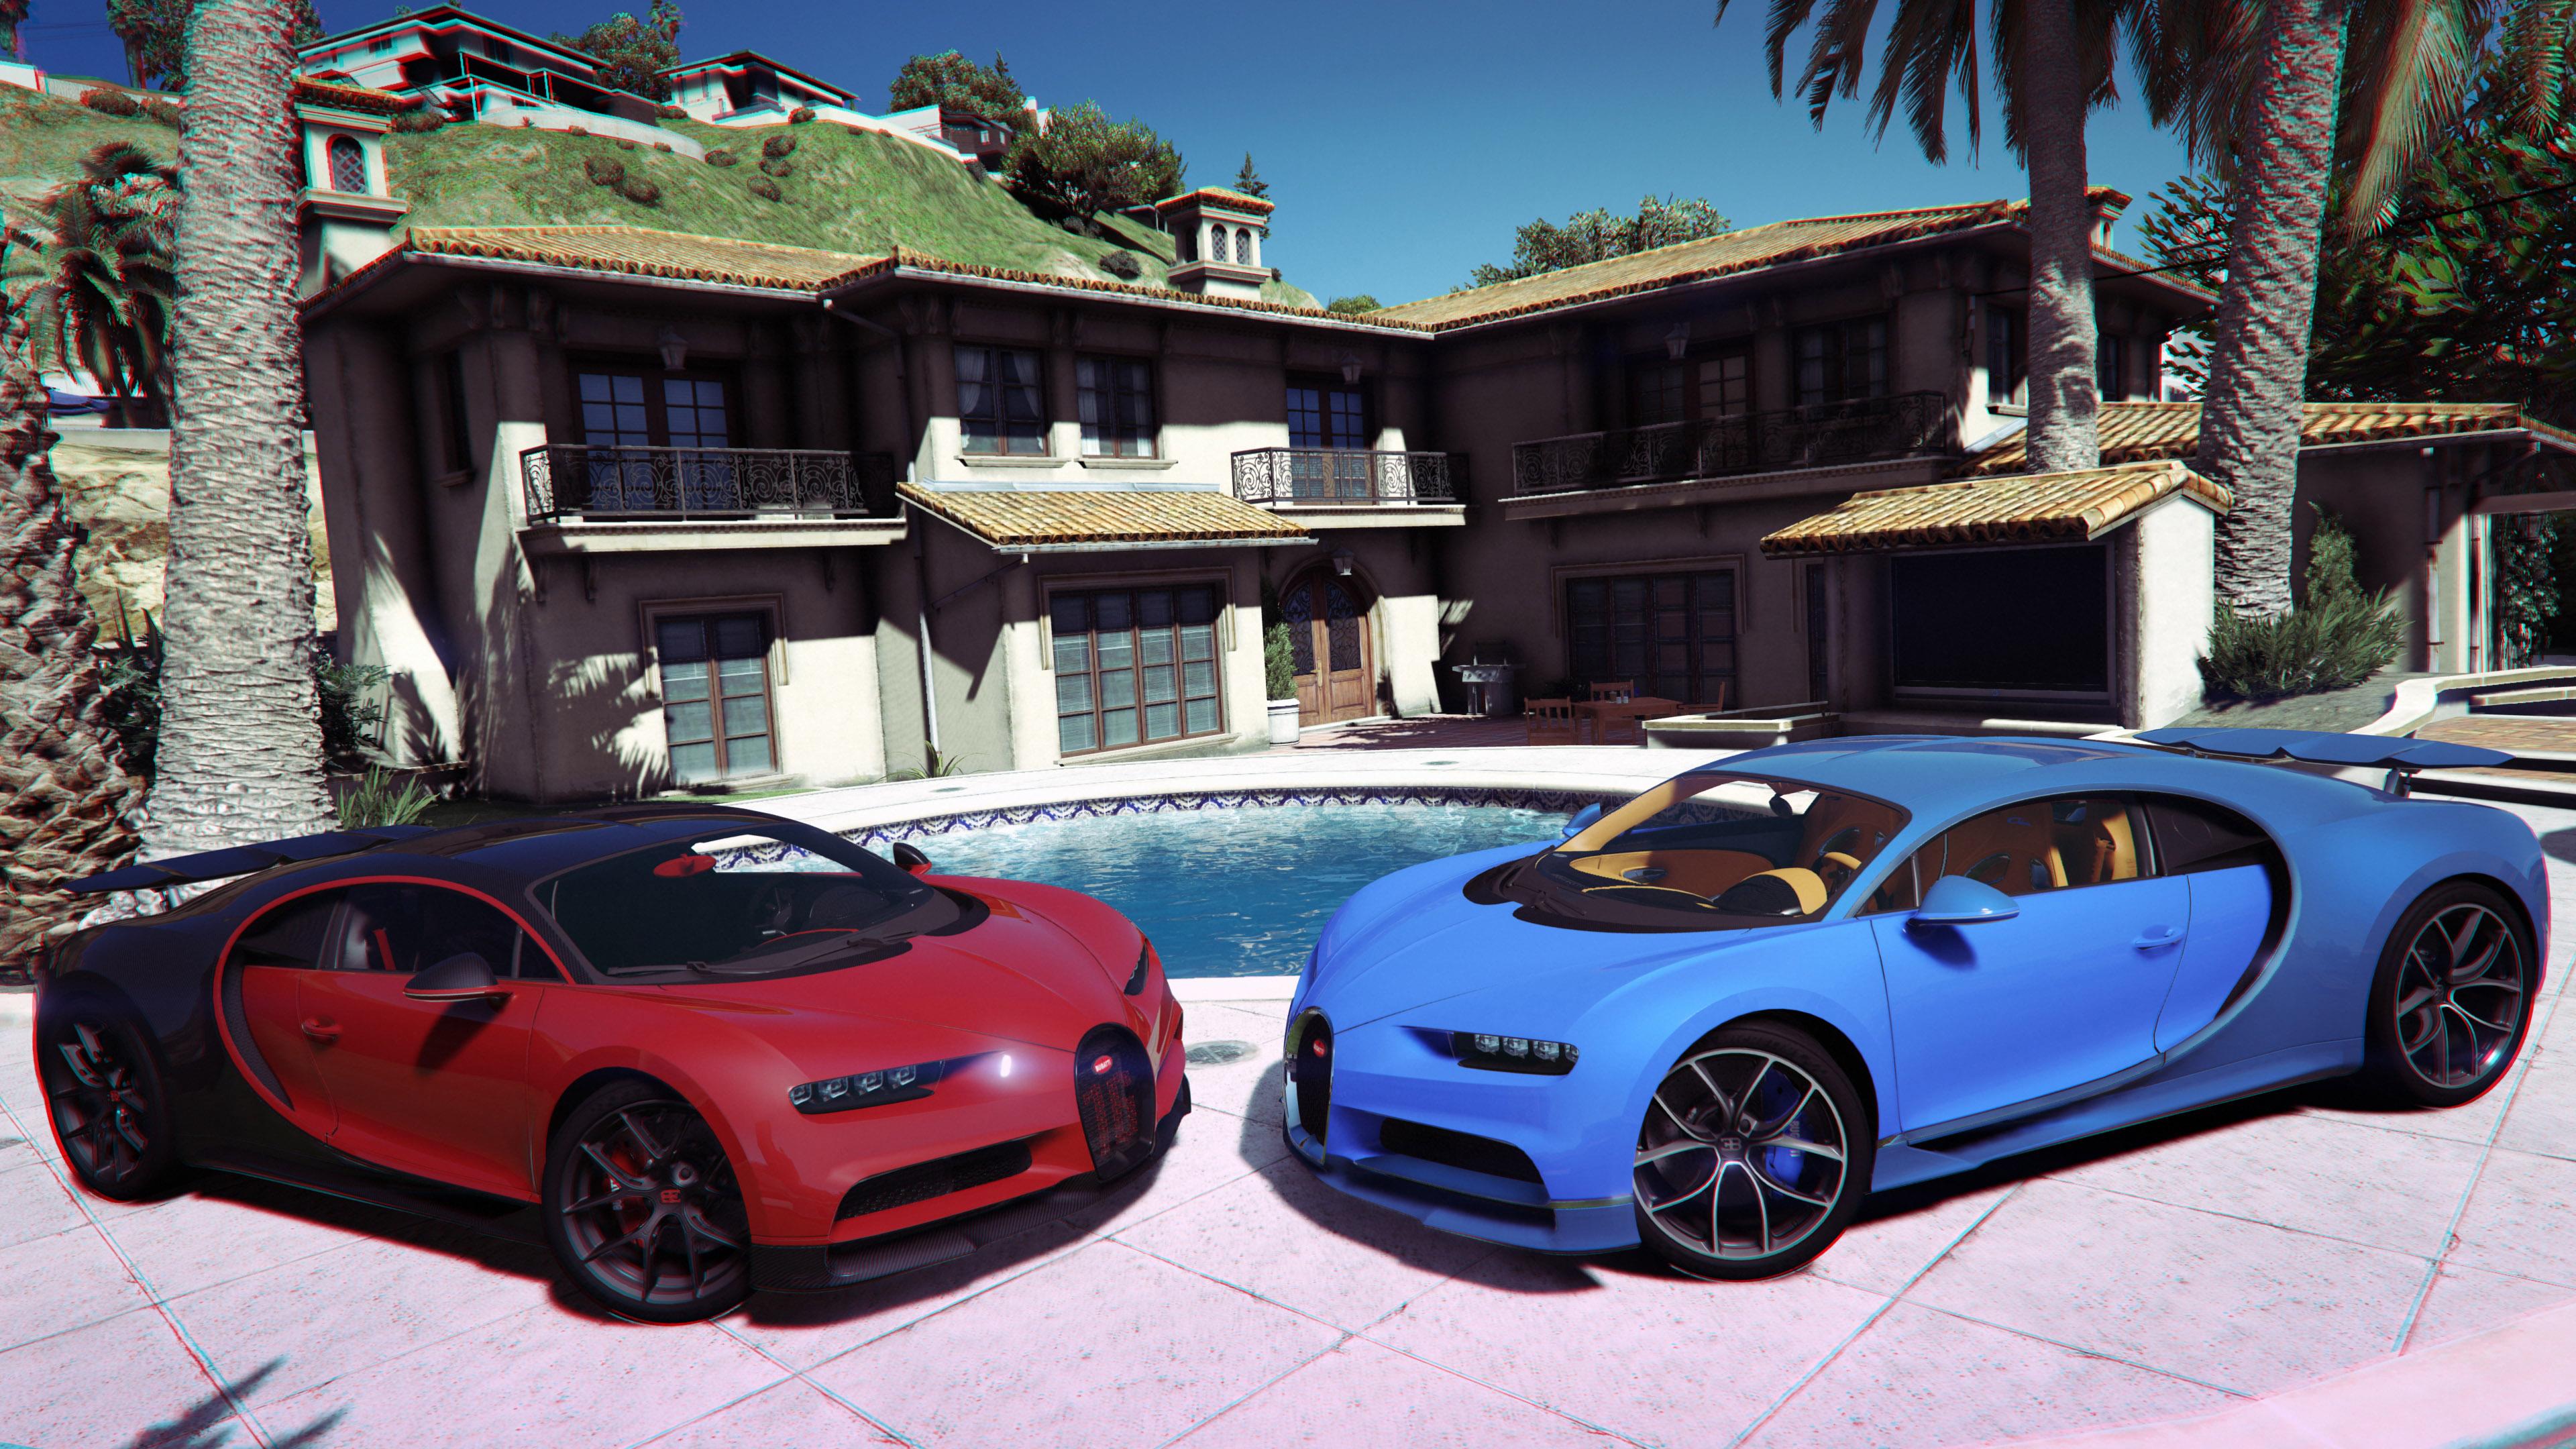 Cla 45 2019 >> 2019 Bugatti Chiron Sport & 2017 Bugatti Chiron [Tuning | Livery] - GTA5-Mods.com